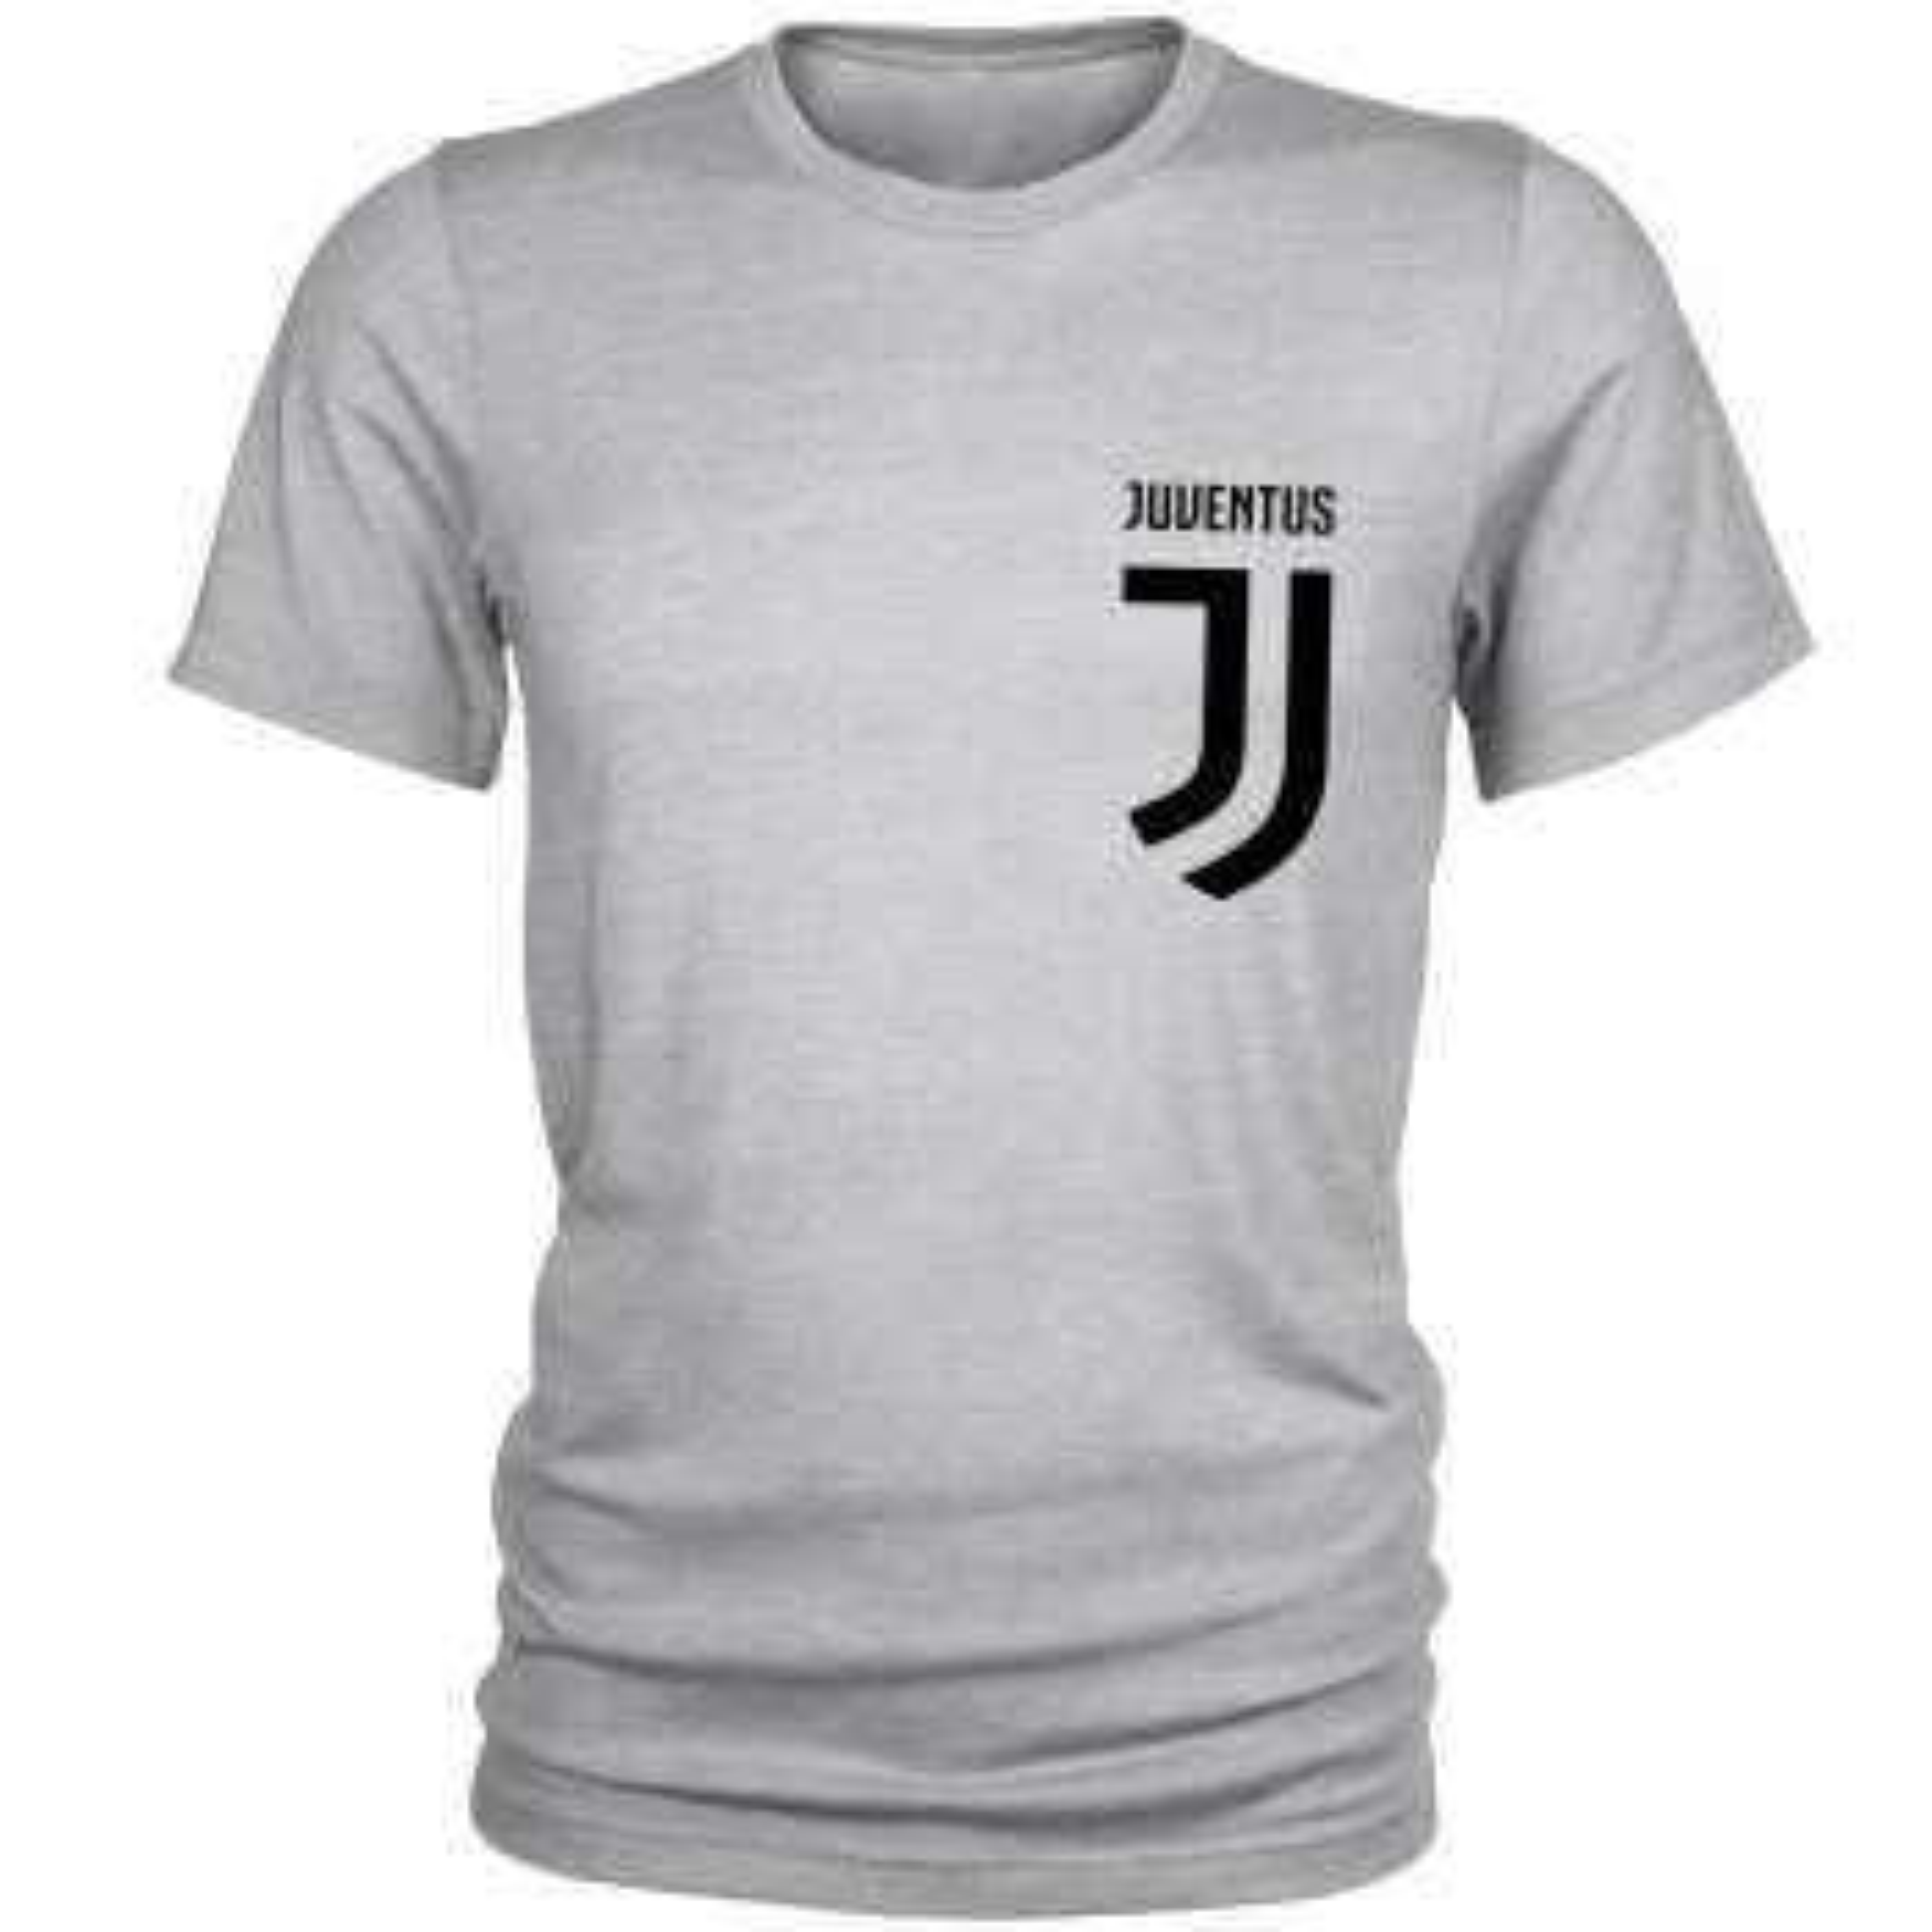 تی شرت مردانه طرح یوونتوس کد S08